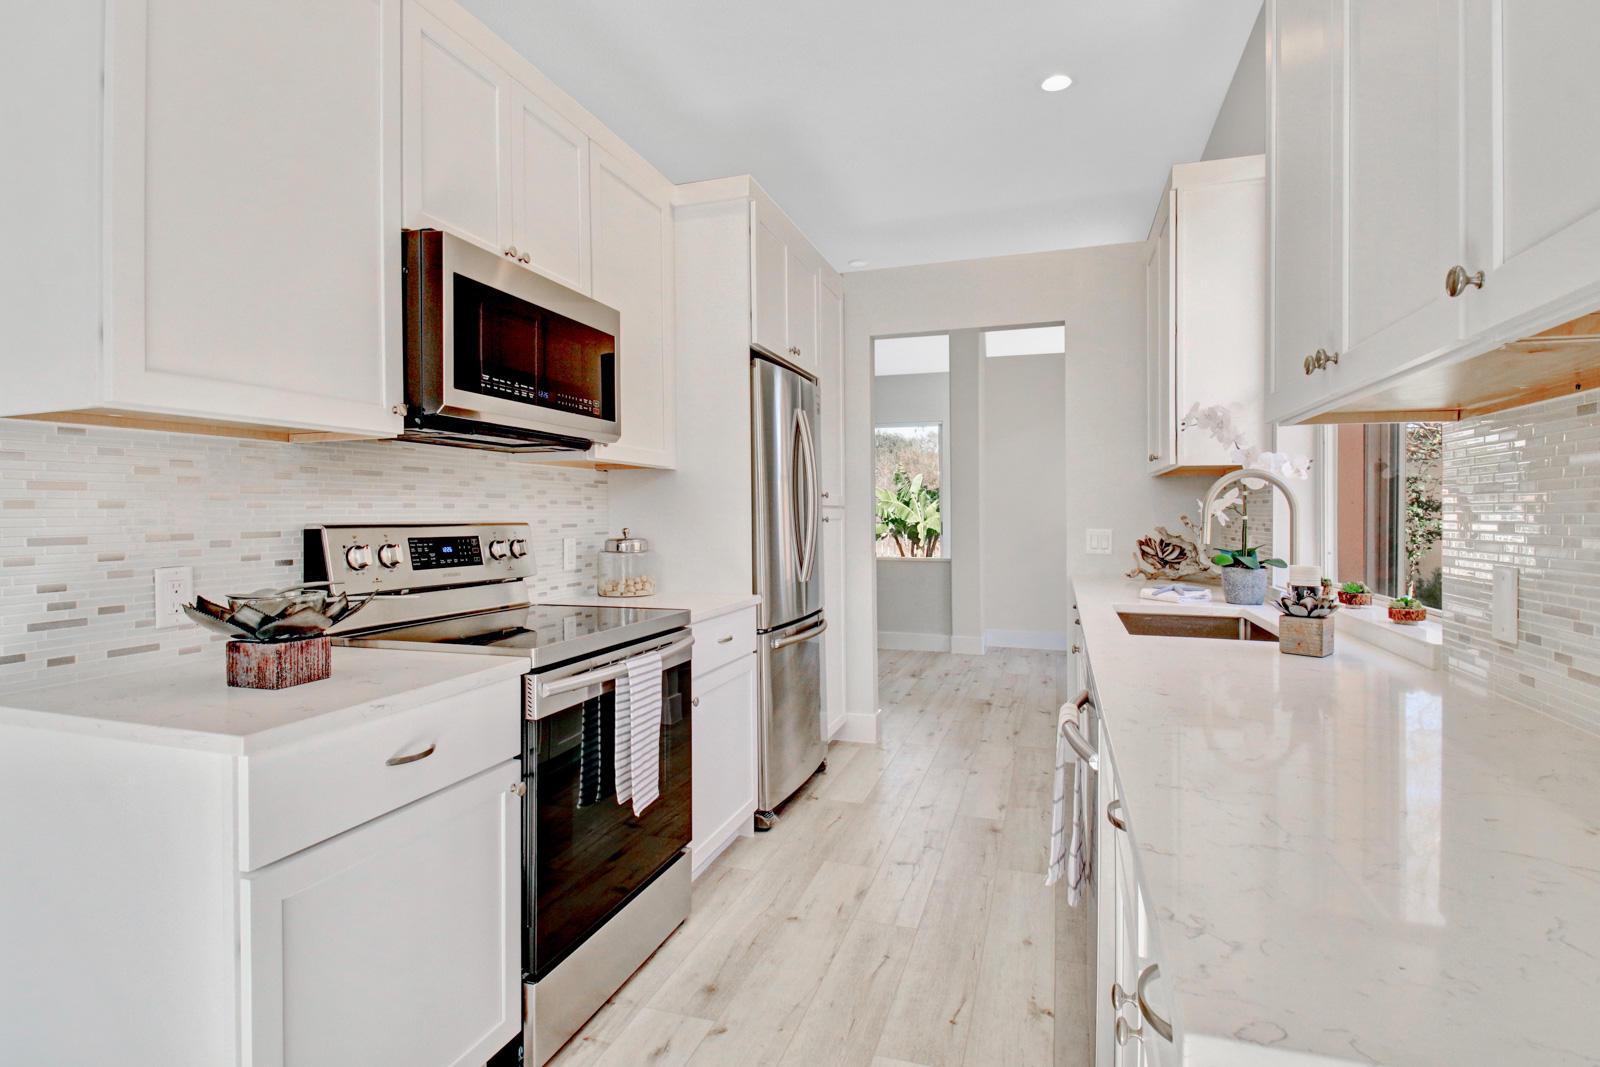 181 S Hampton Drive  - Abacoa Homes - photo 11